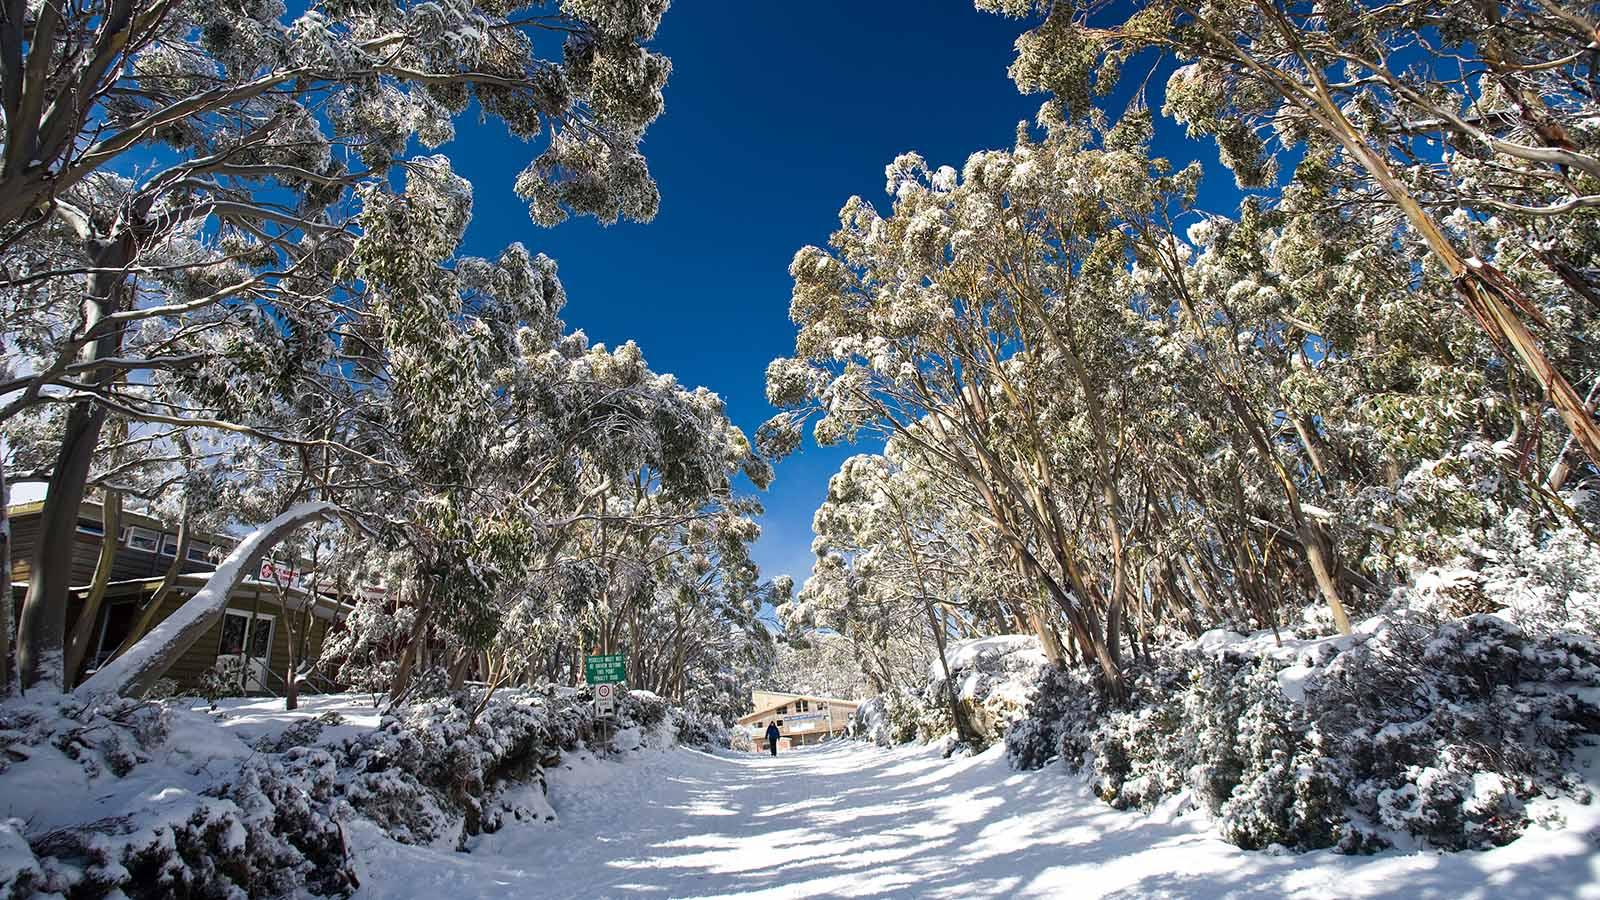 Mt Baw Baw Alpine Resort, Victoria, Australia